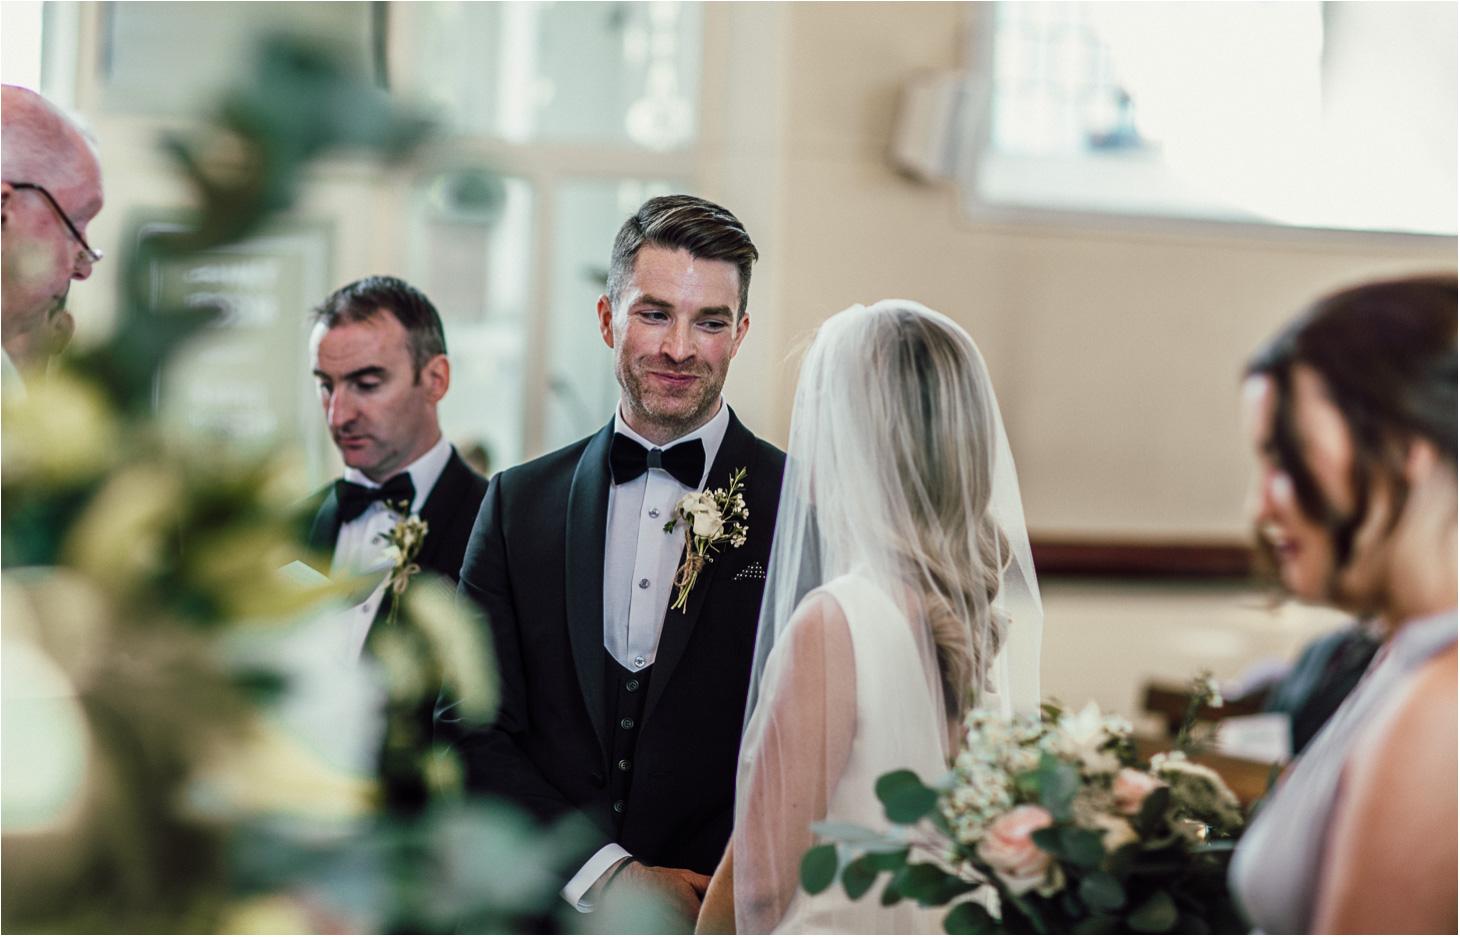 Virgina Lodge Photography. darren fitzpatrick. Wedding.9